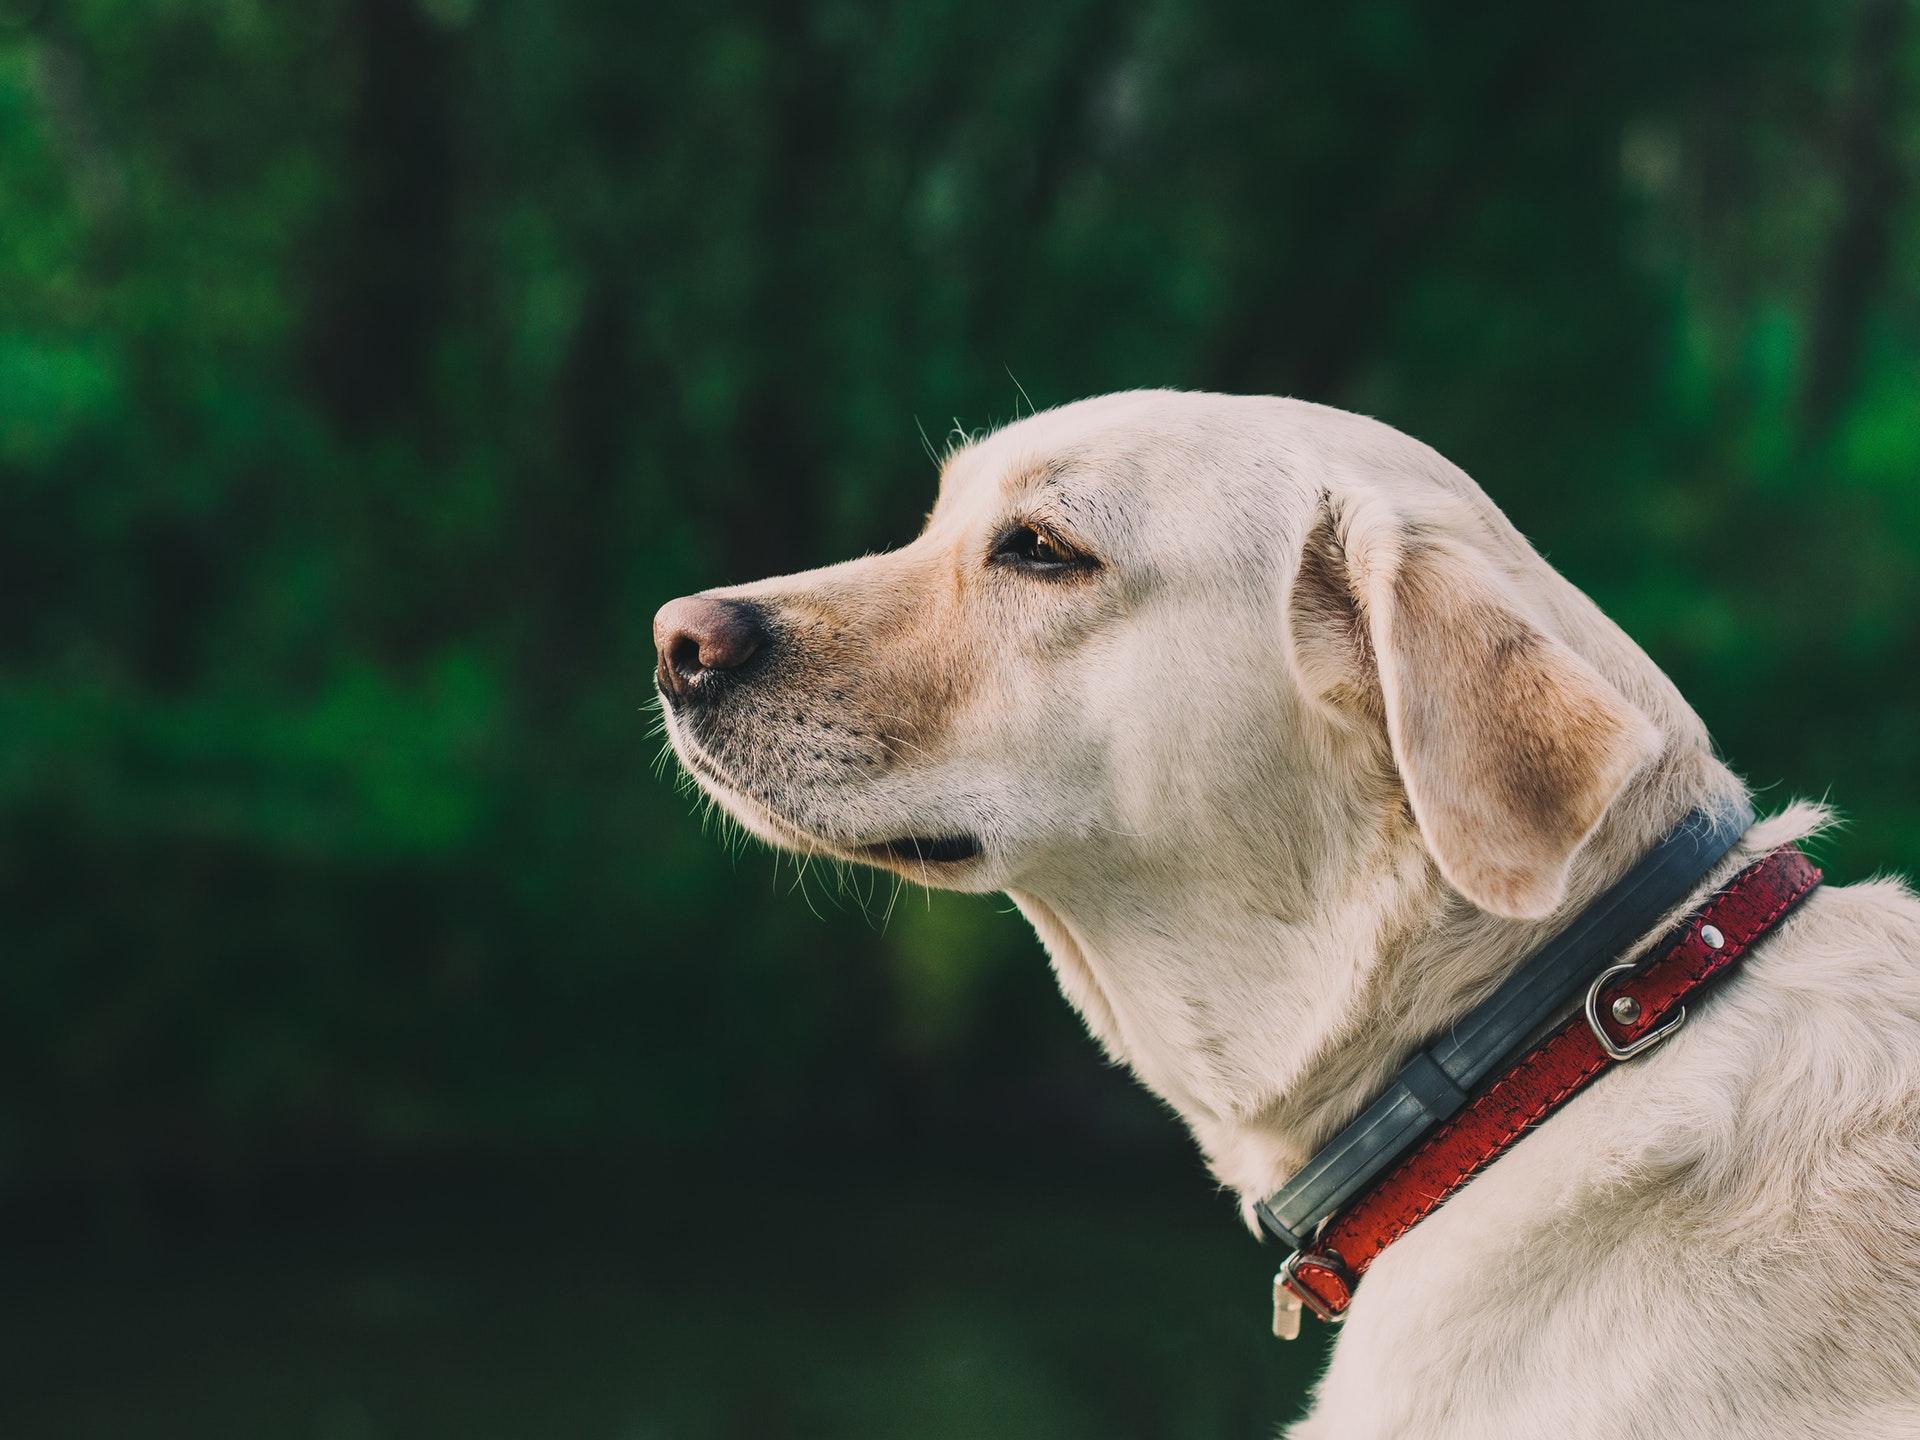 nature-animal-dog-pet